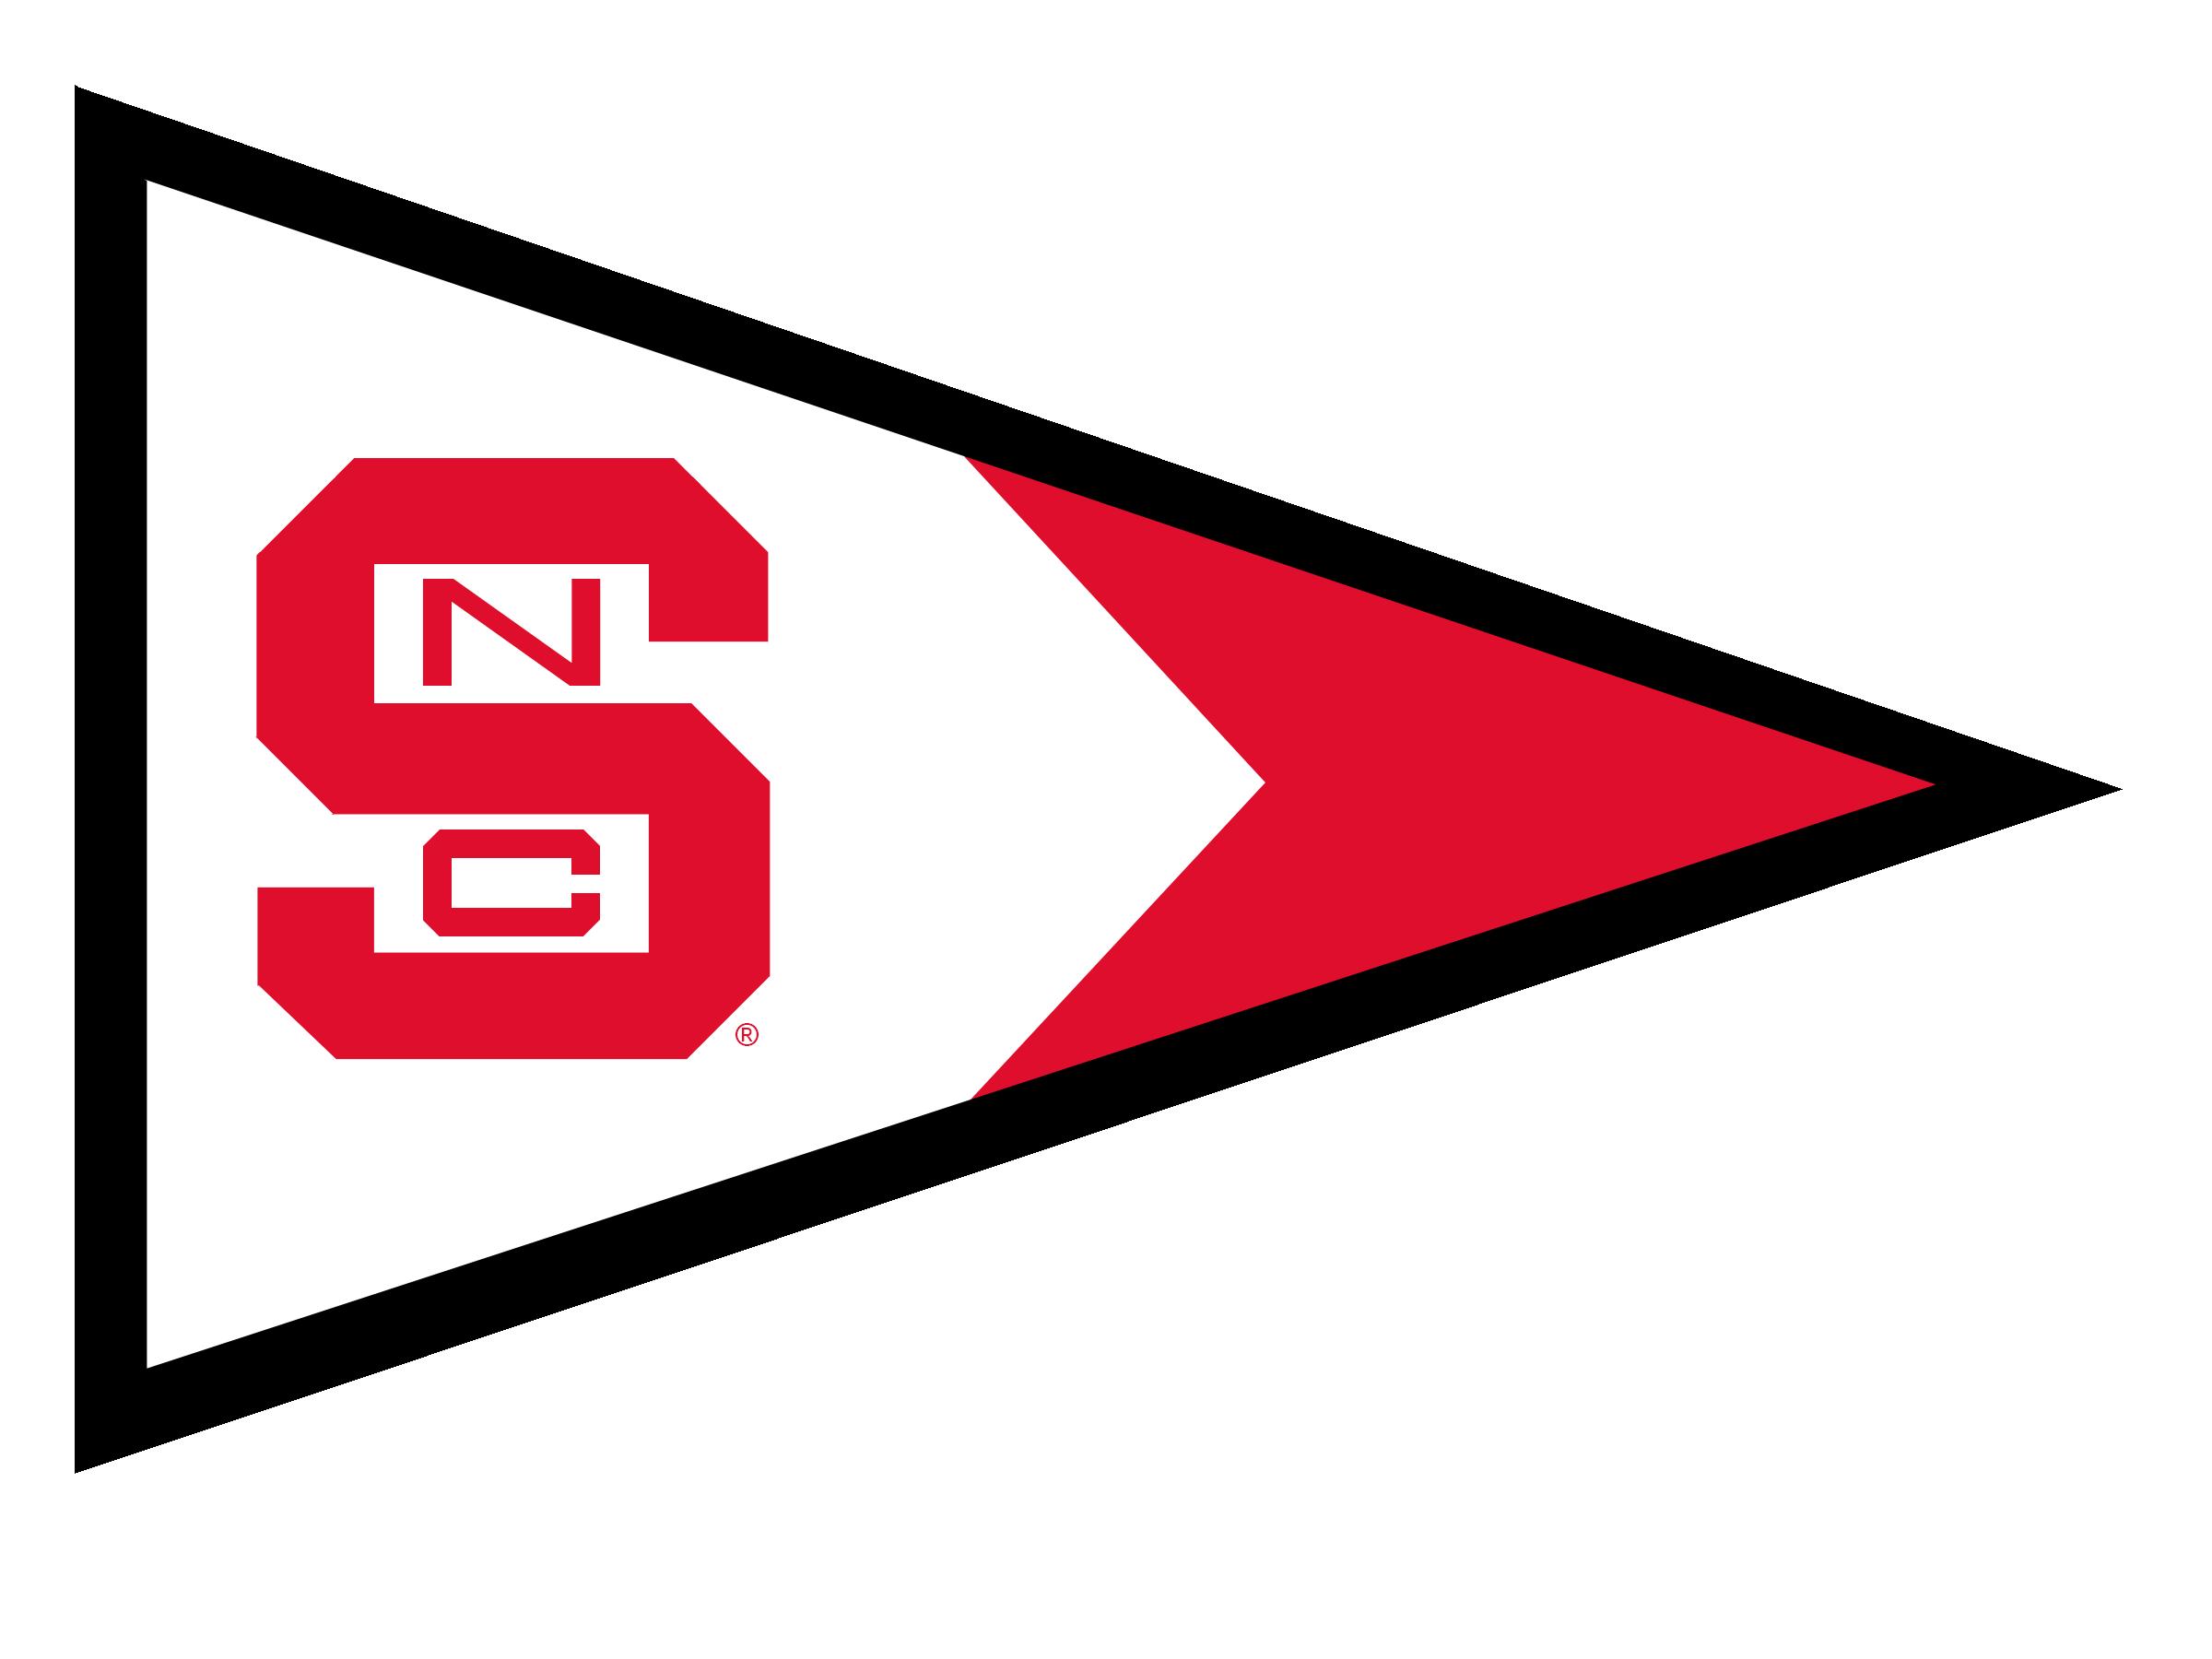 NCSU_Burgee_Master_File_(Web).png